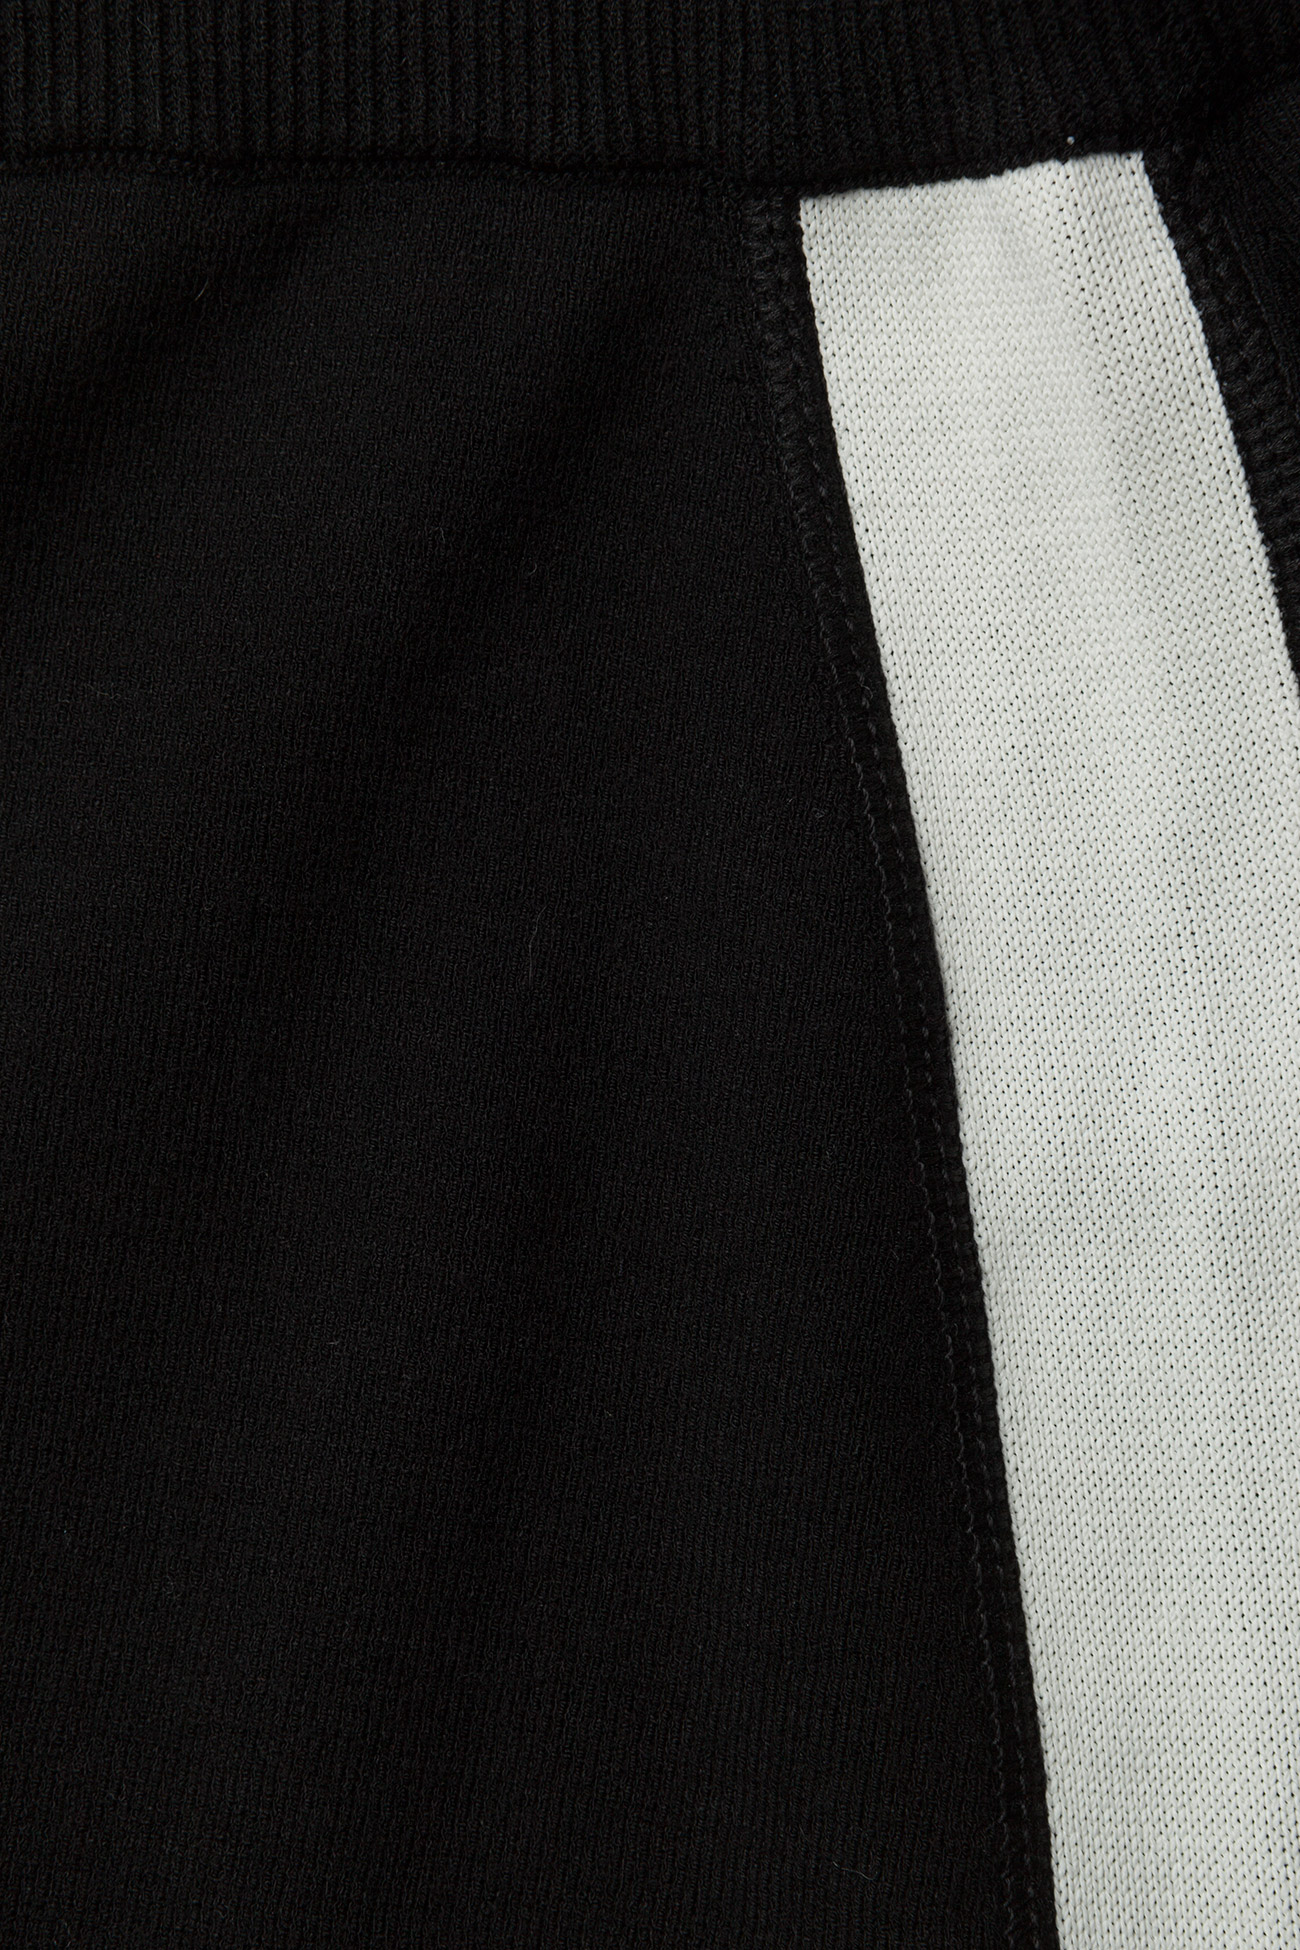 Sportmax Code Silvana (Black), 839